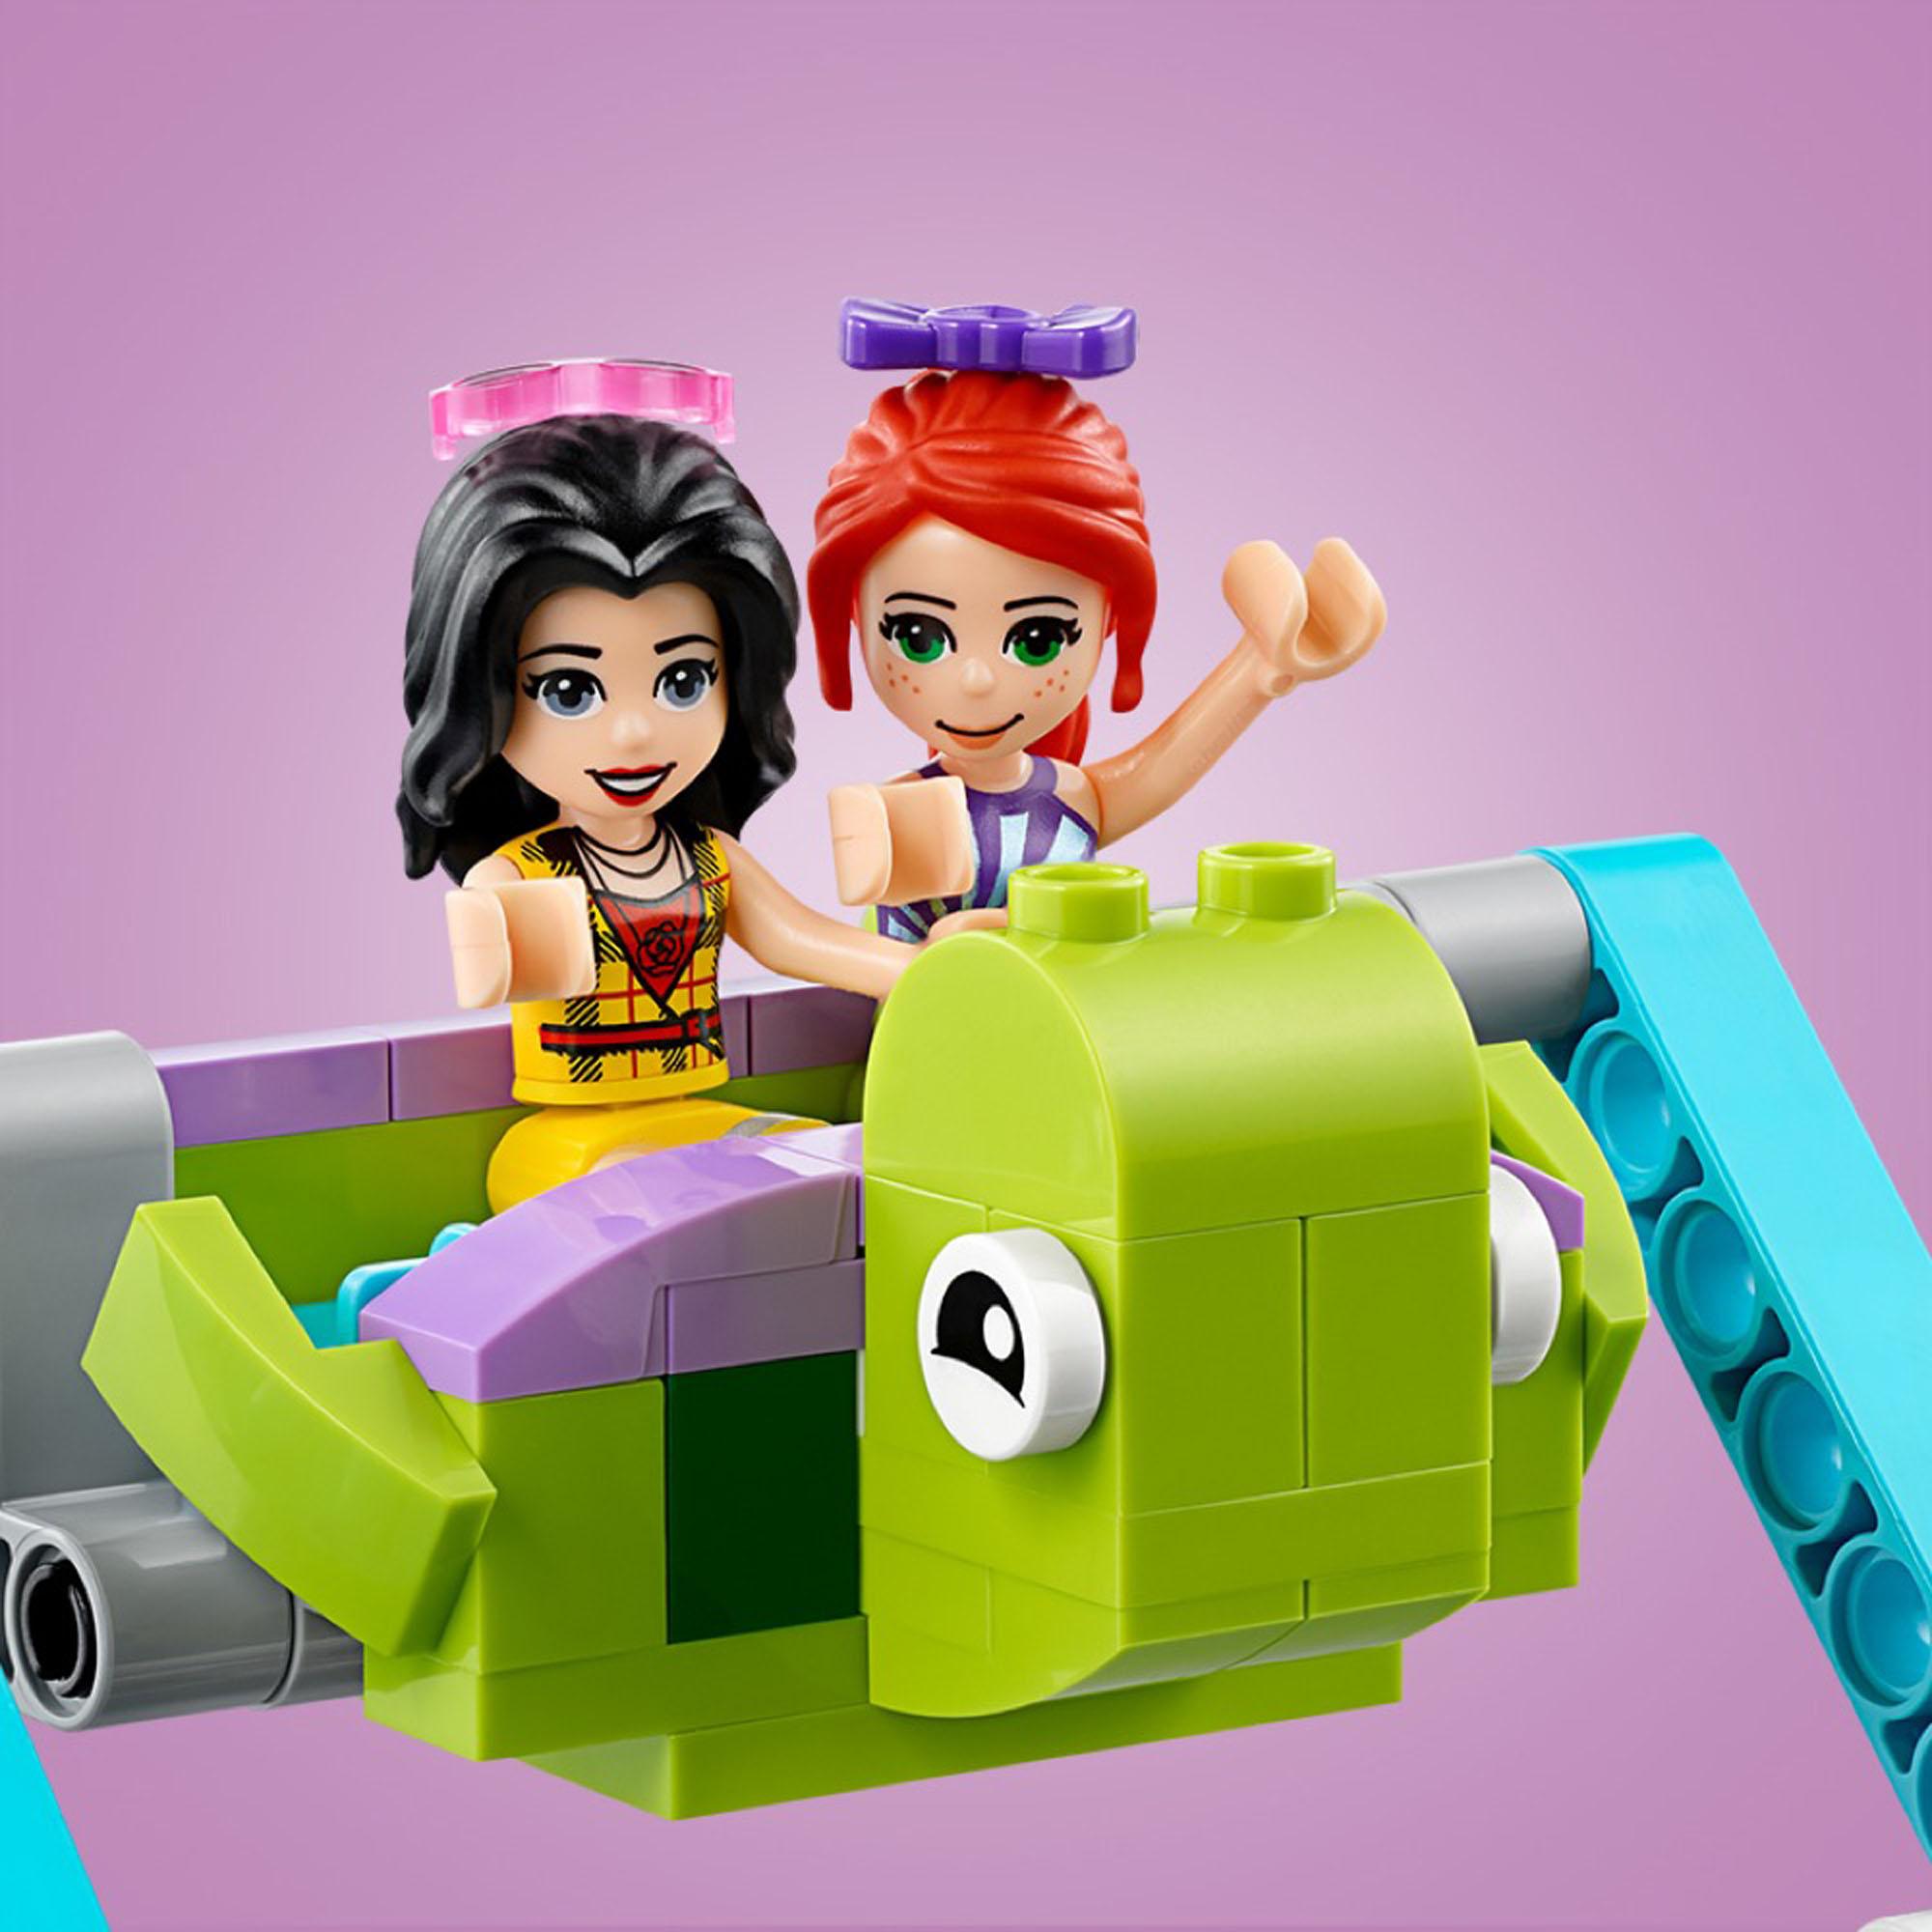 41337 LEGO FRIENDS Underwater Boucle